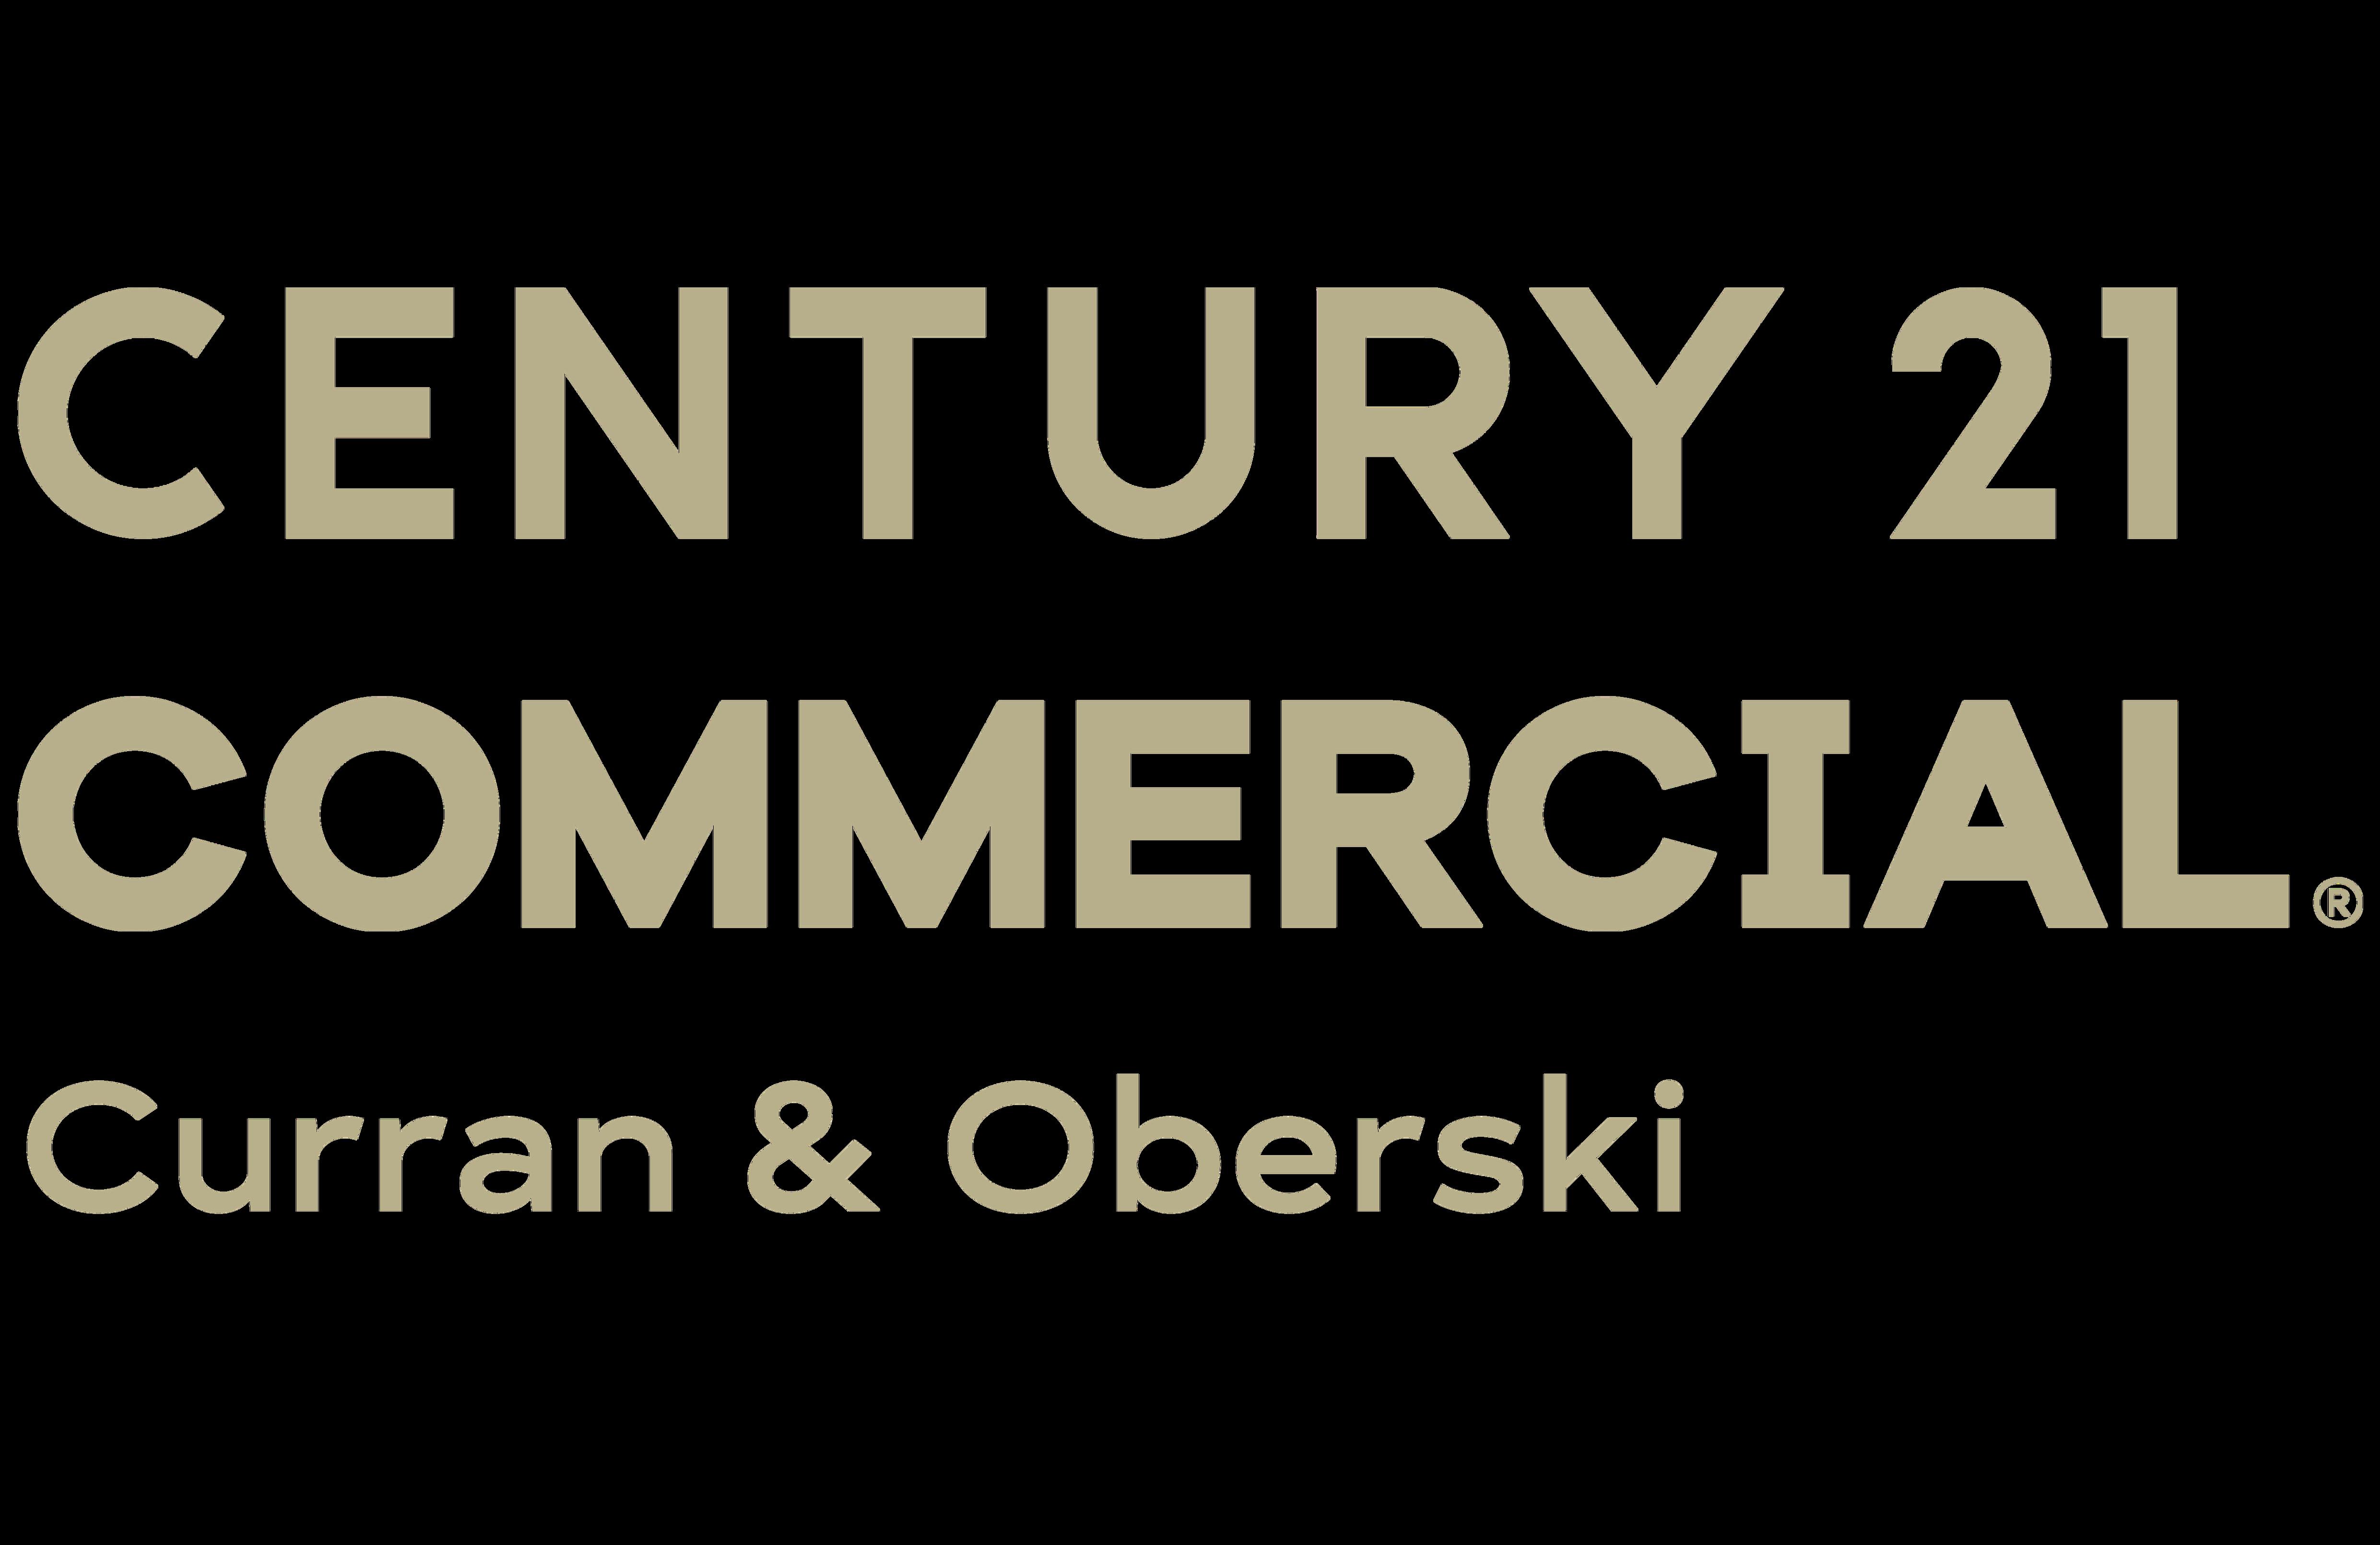 CENTURY 21 Curran & Oberski